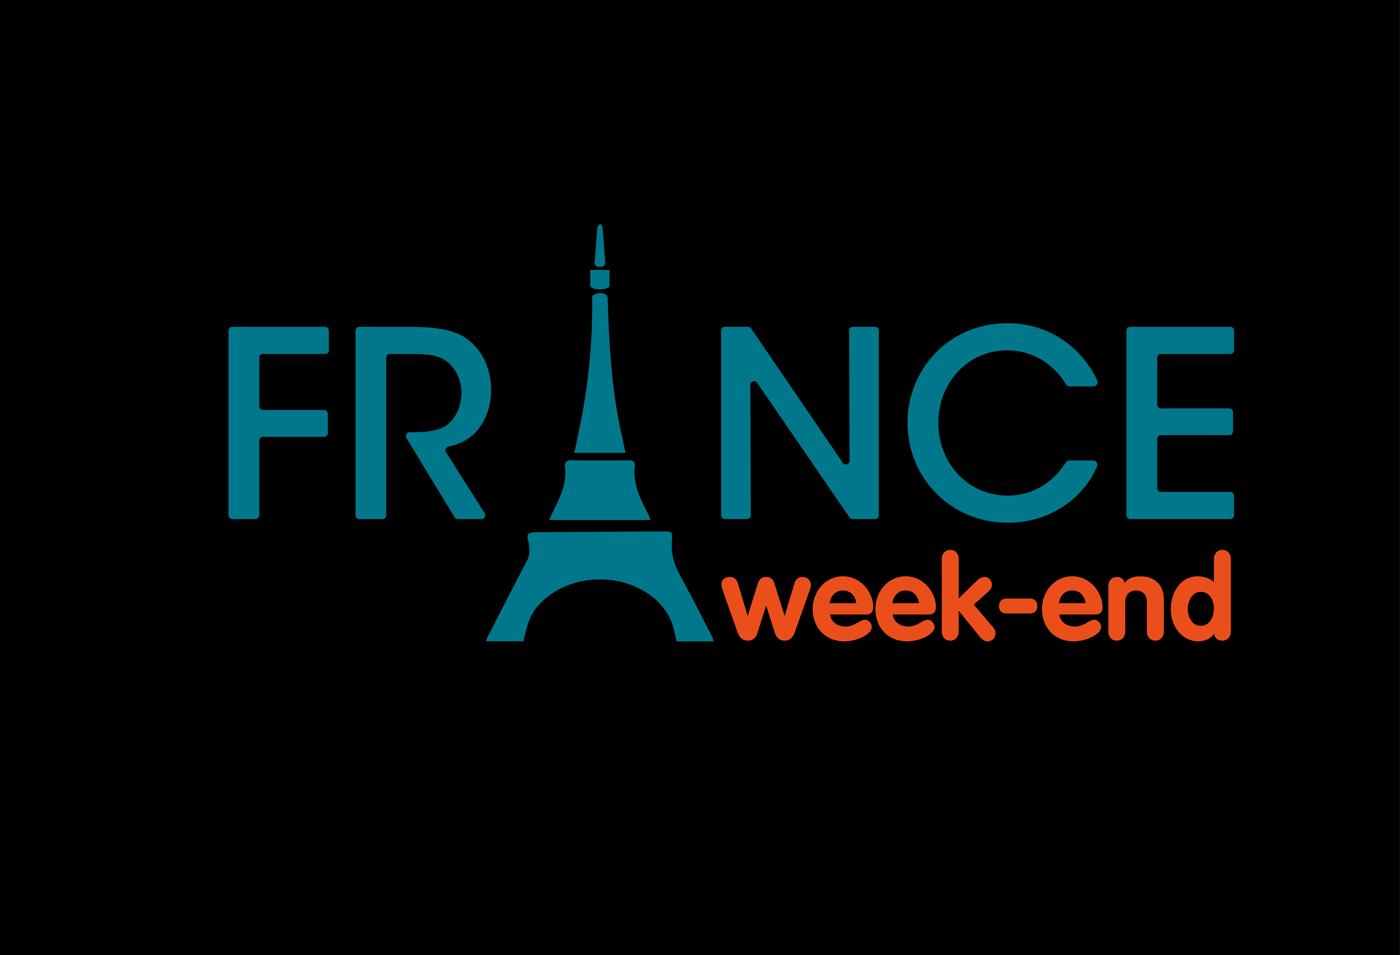 logo-france-week-end